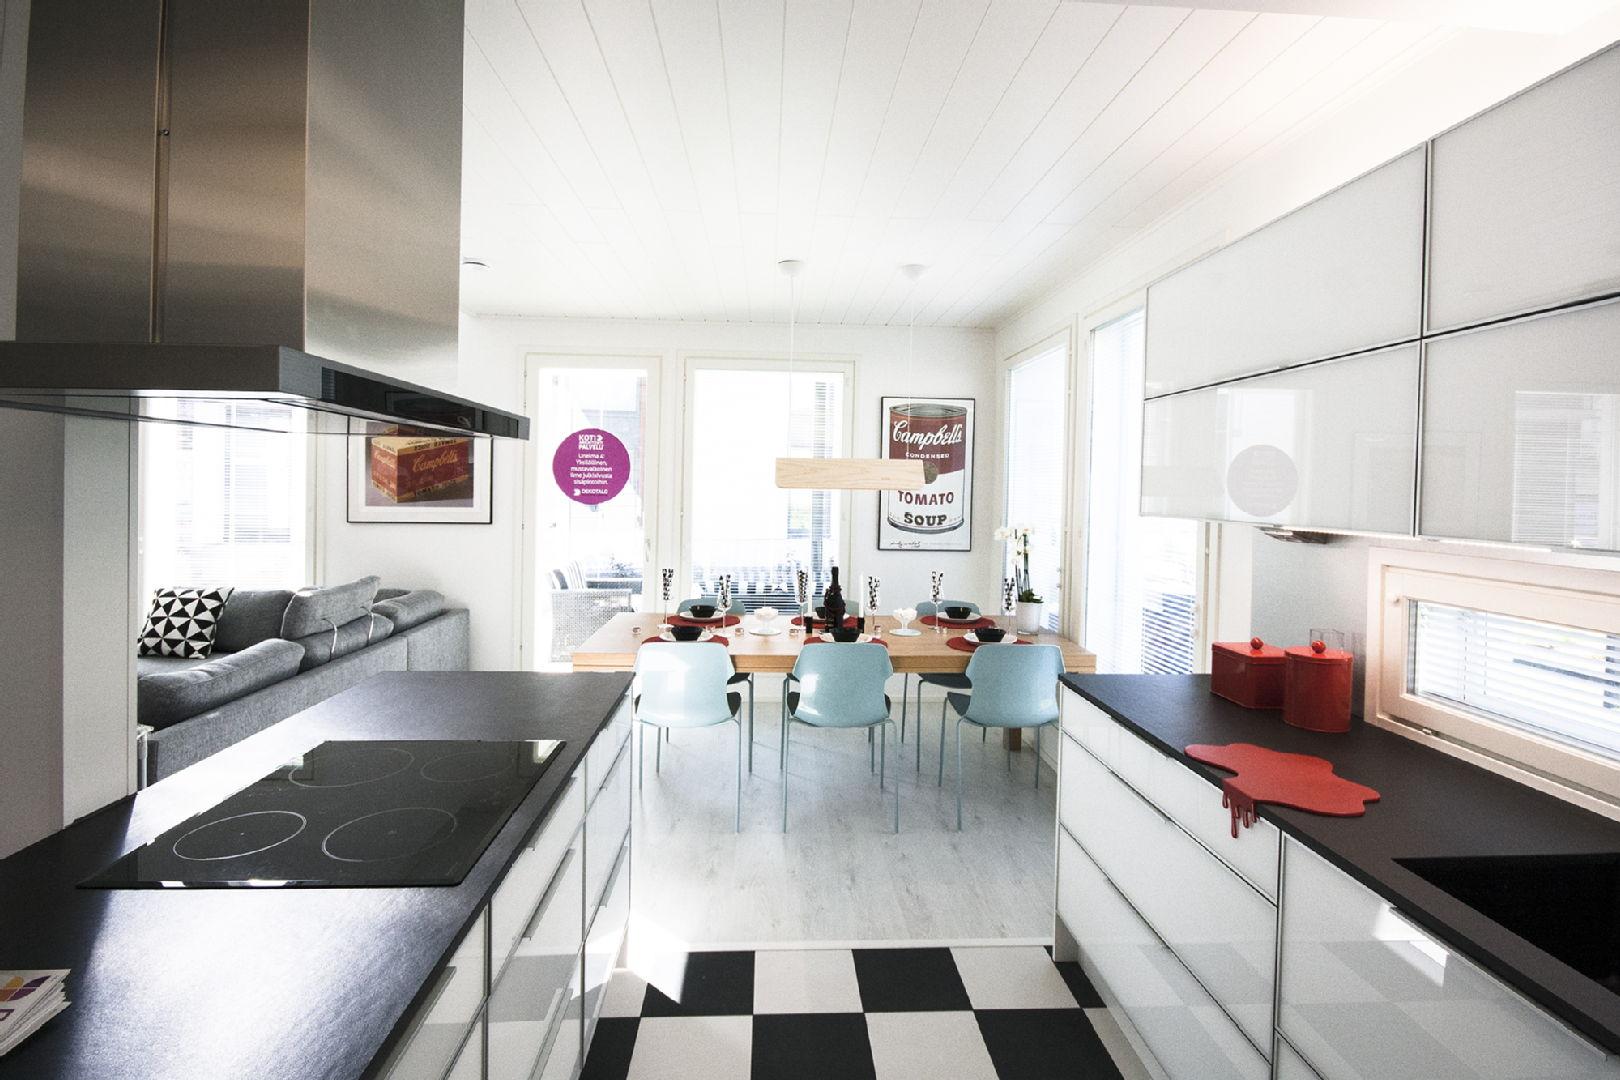 Moderni keittiö, Asuntomessut 2015, Asuntomessut 2015 Vantaa, 55b9d6c9e4b0c08